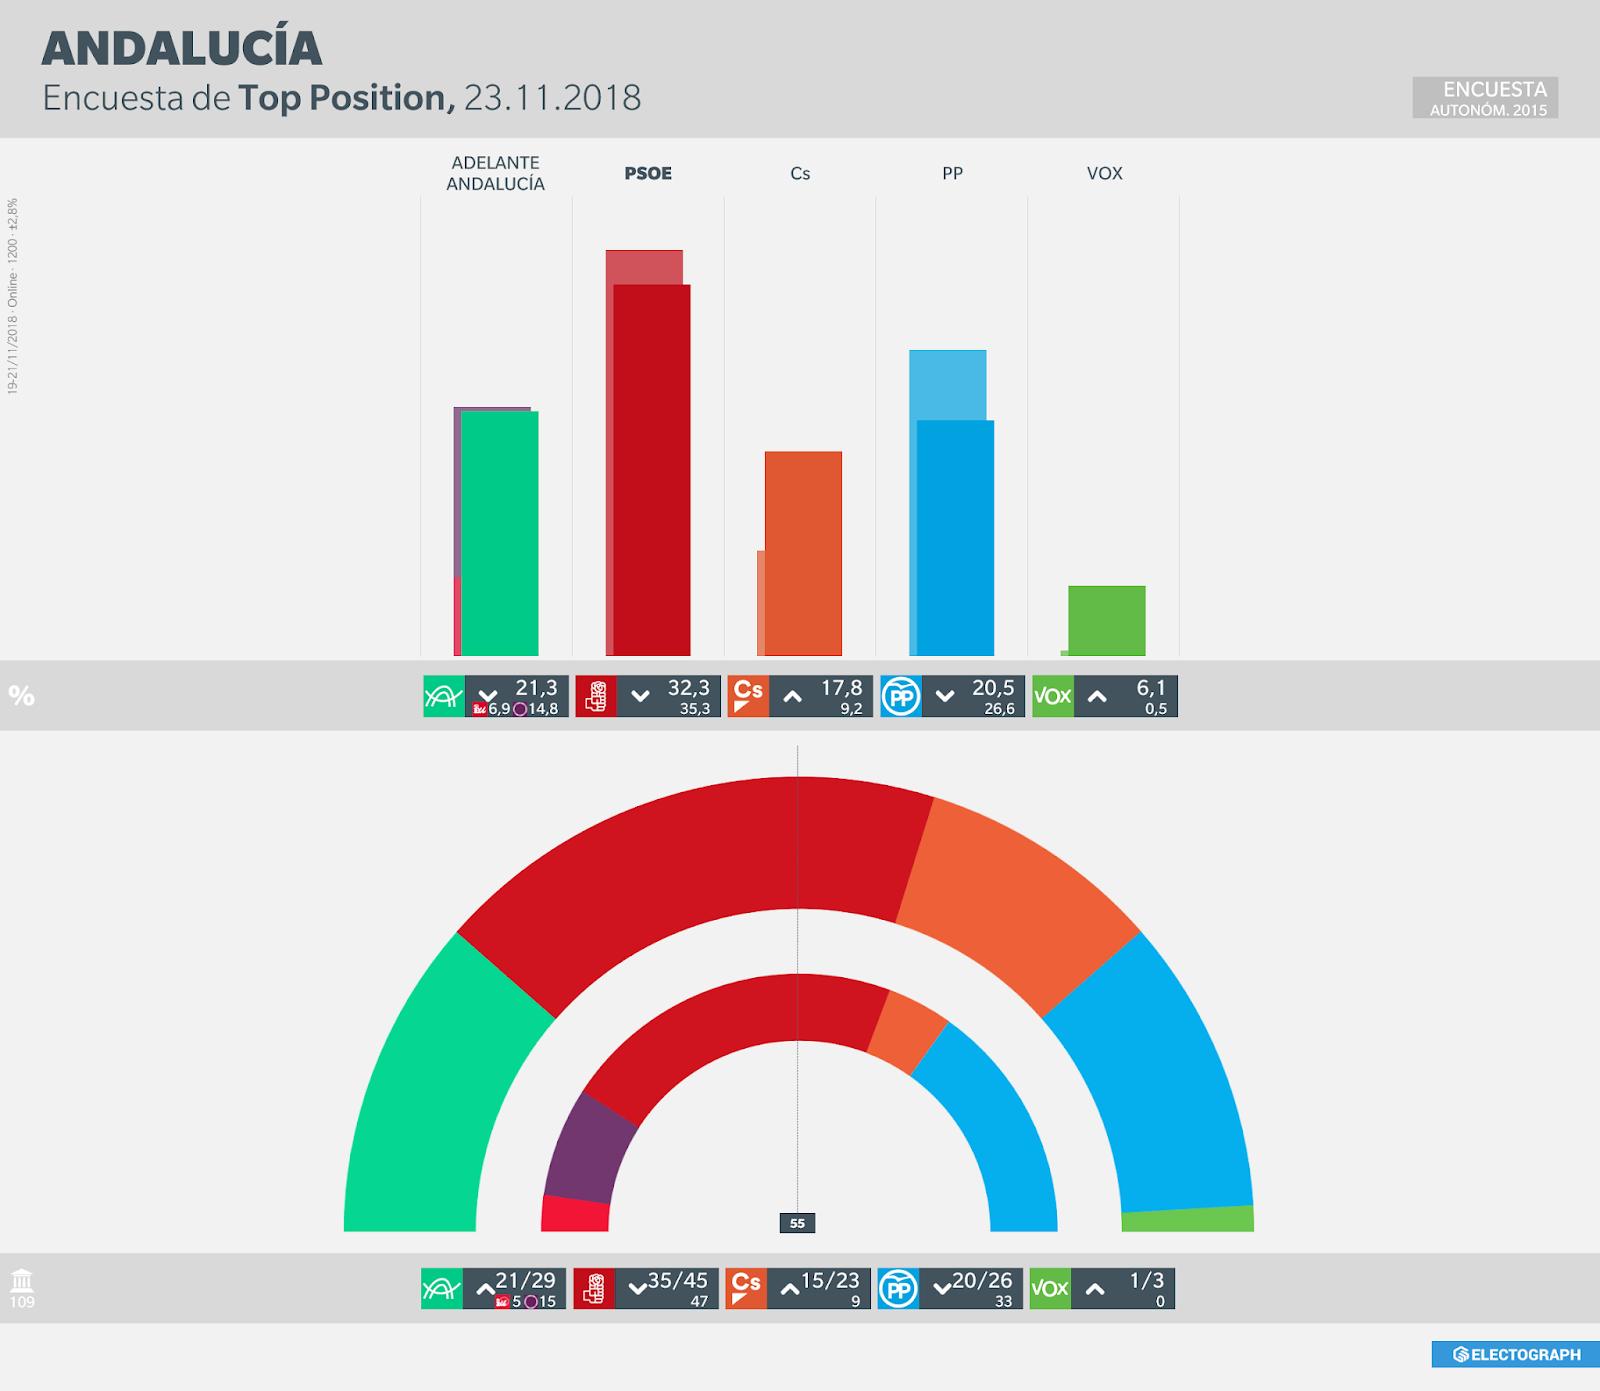 andalucÍa encuesta top position aa 21 3 21 29 psoe 32 3 35